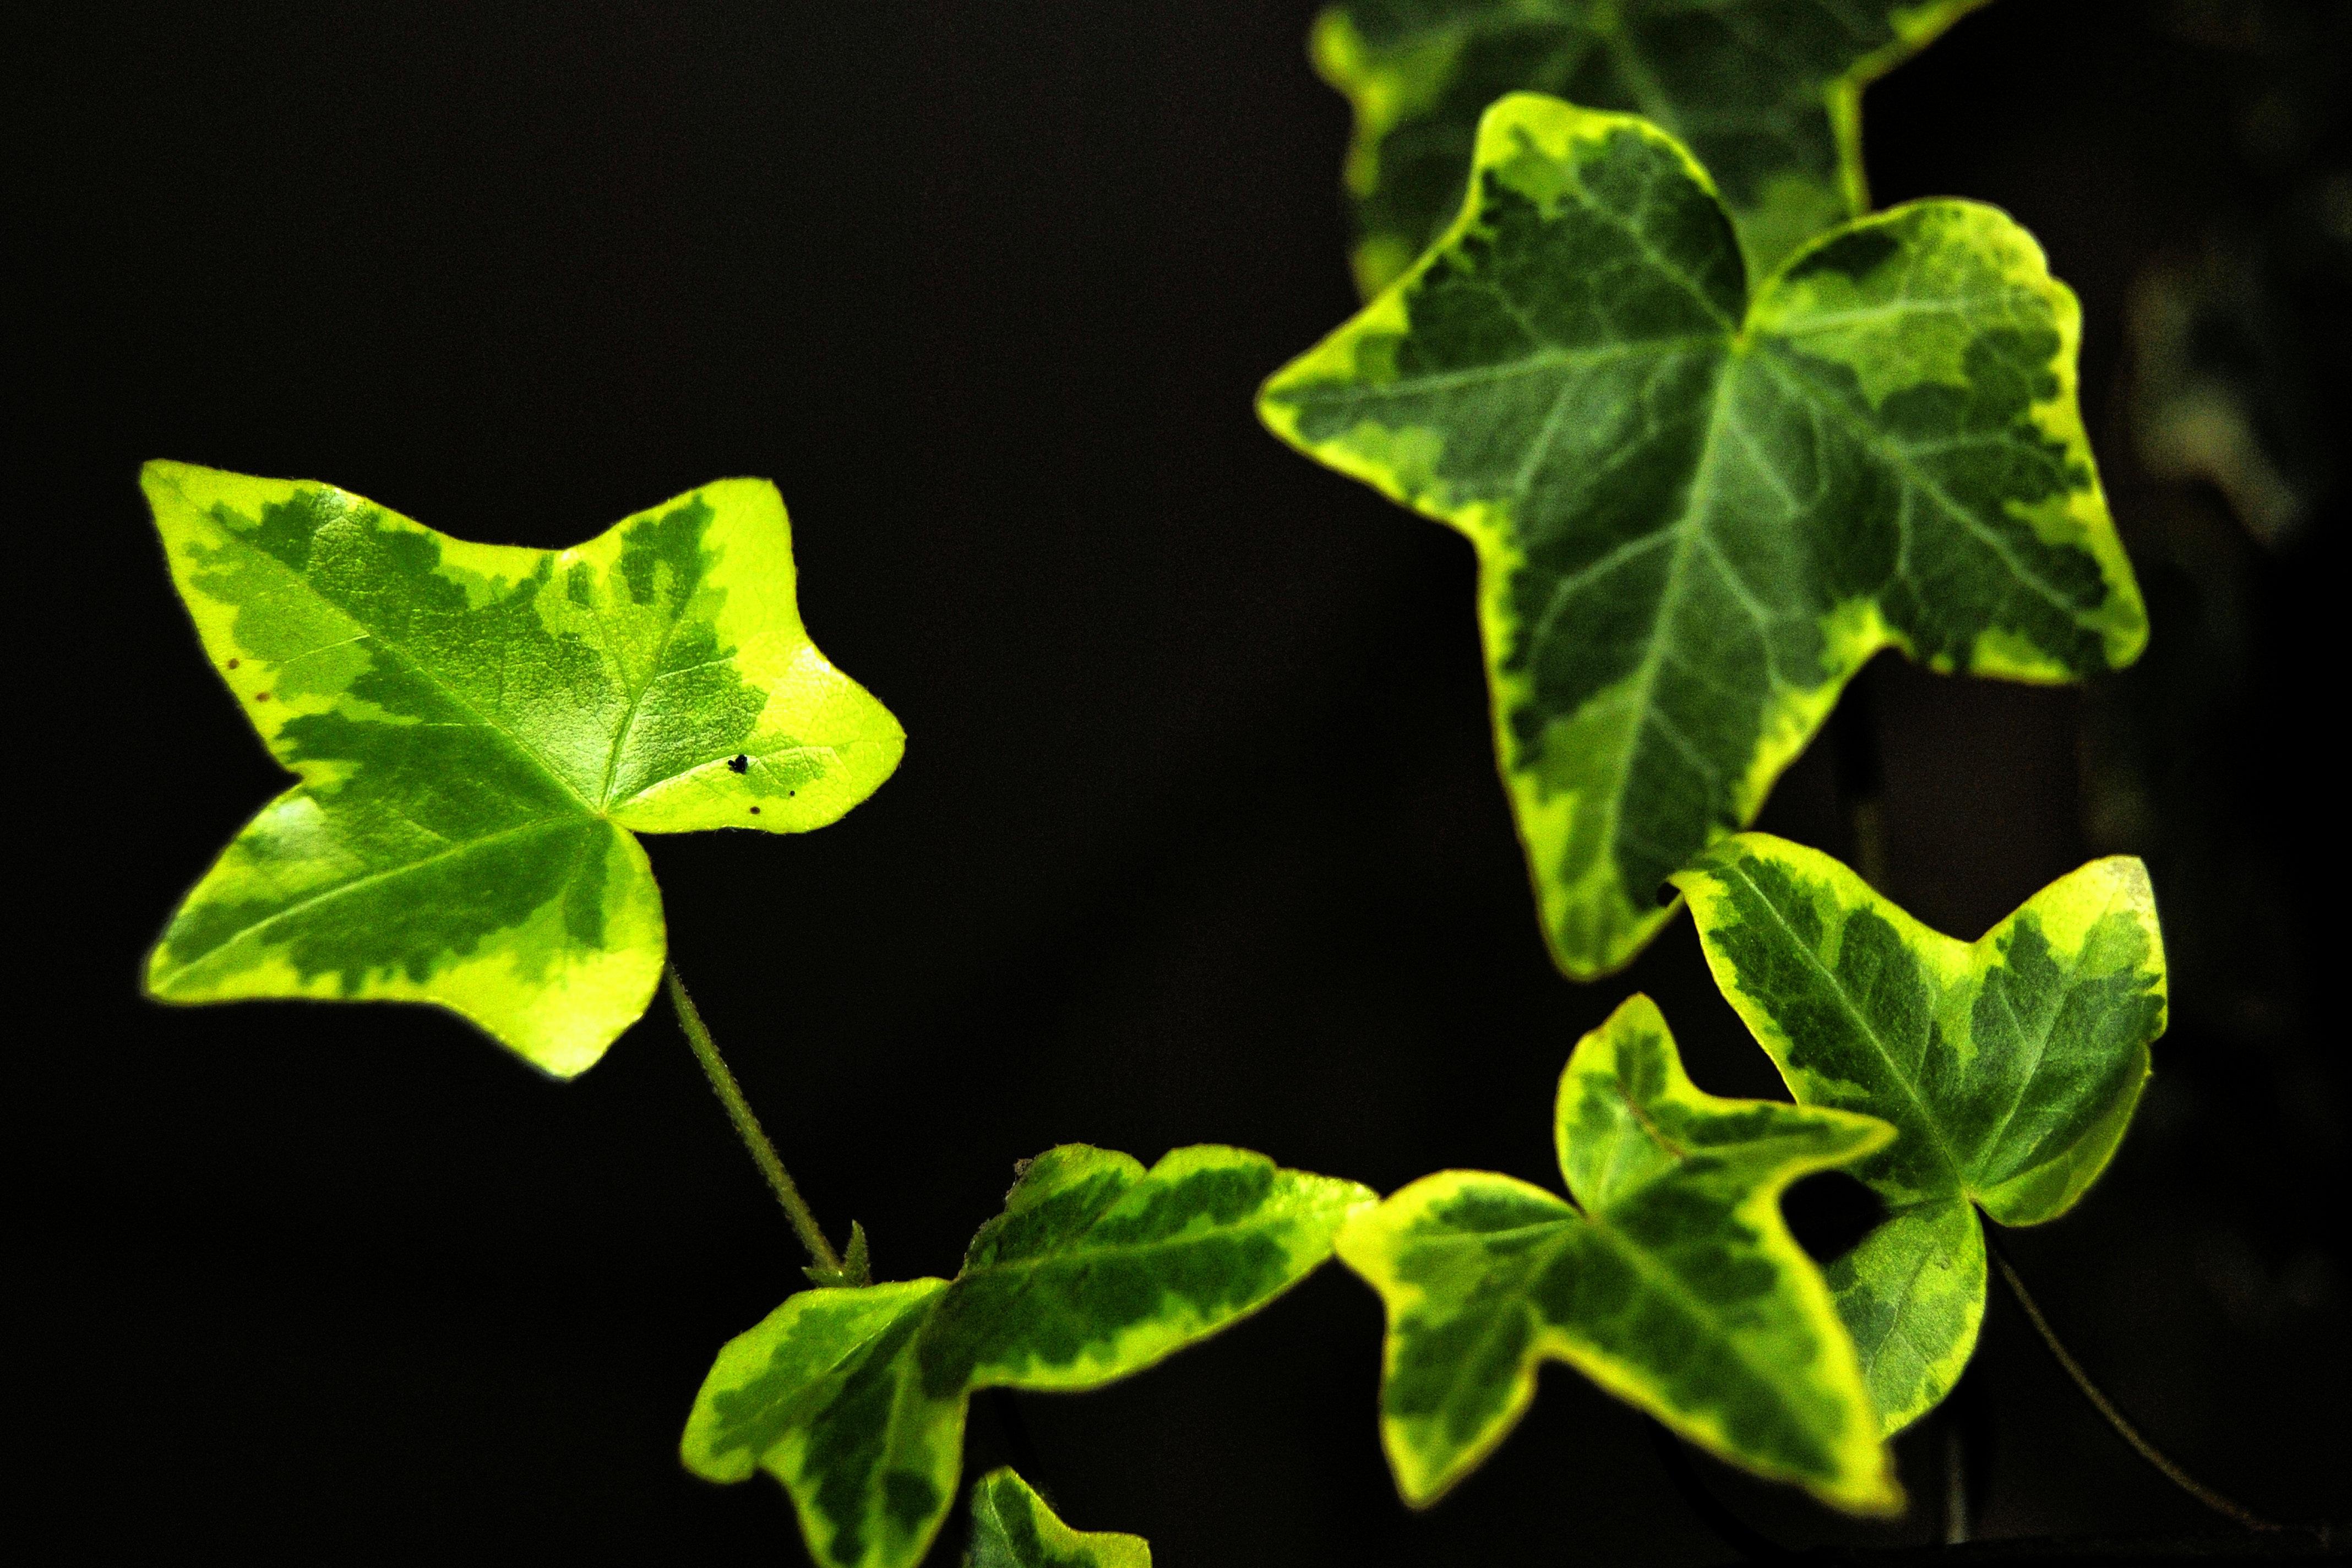 картинки зеленого плюща свою очередь могут